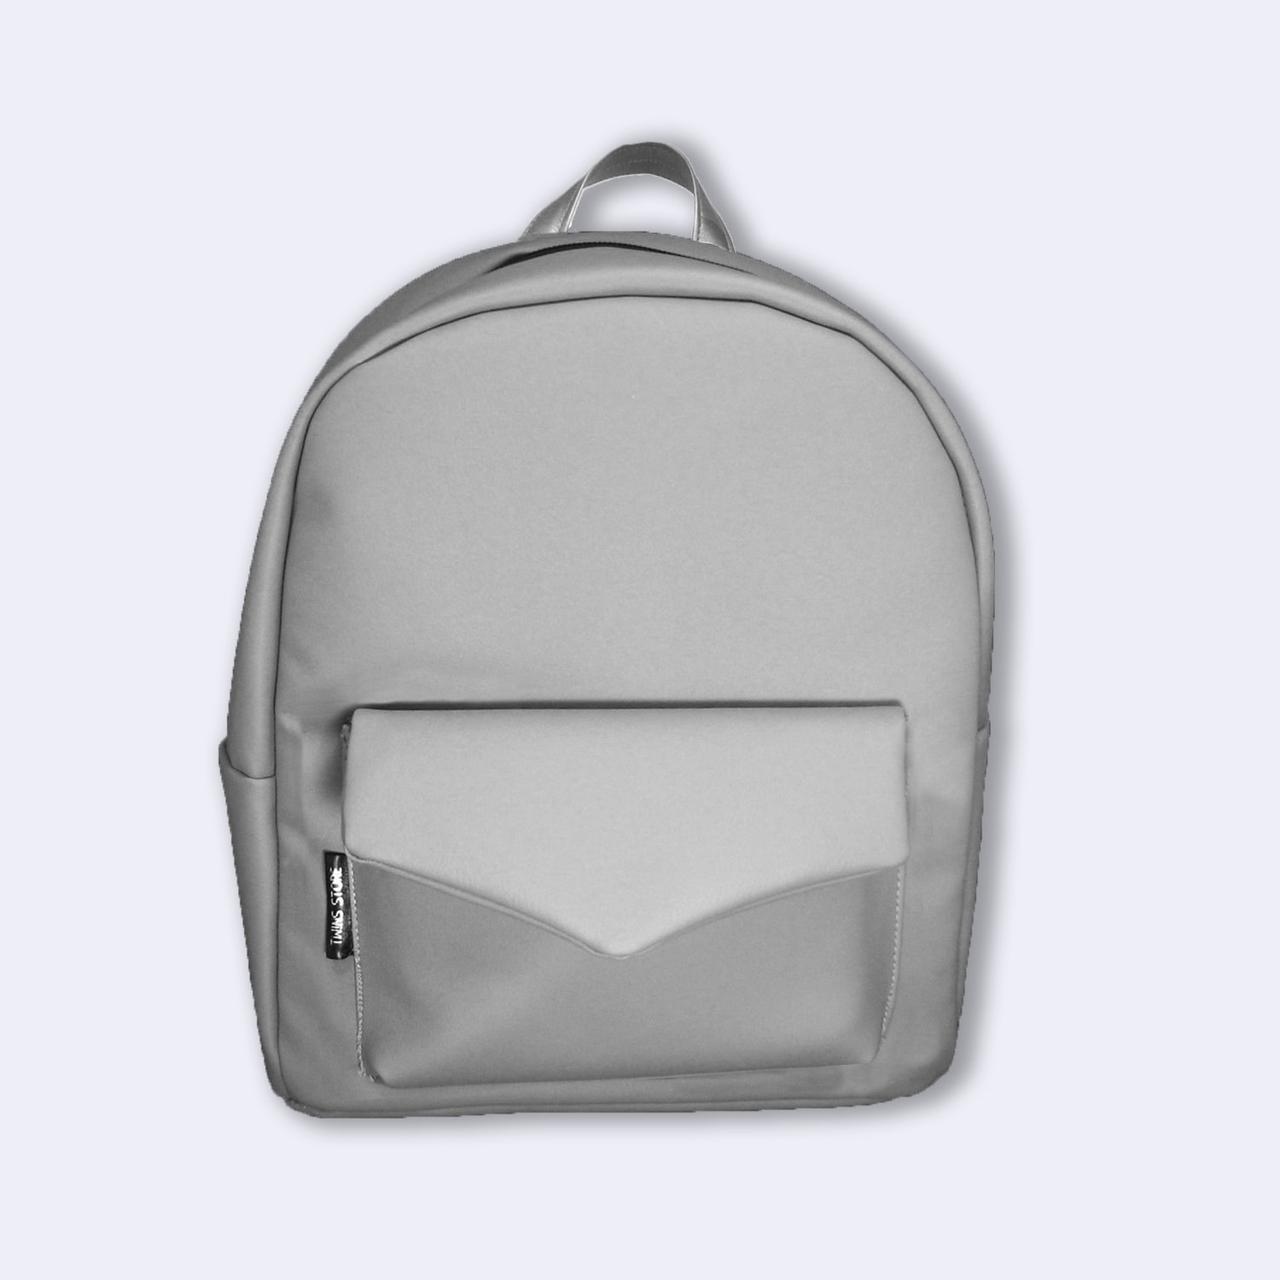 7d2adcfa6f29 Светло-серый кожаный рюкзак Р34 TWINS STORE, цена 749 грн., купить в Киеве  — Prom.ua (ID#563085549)